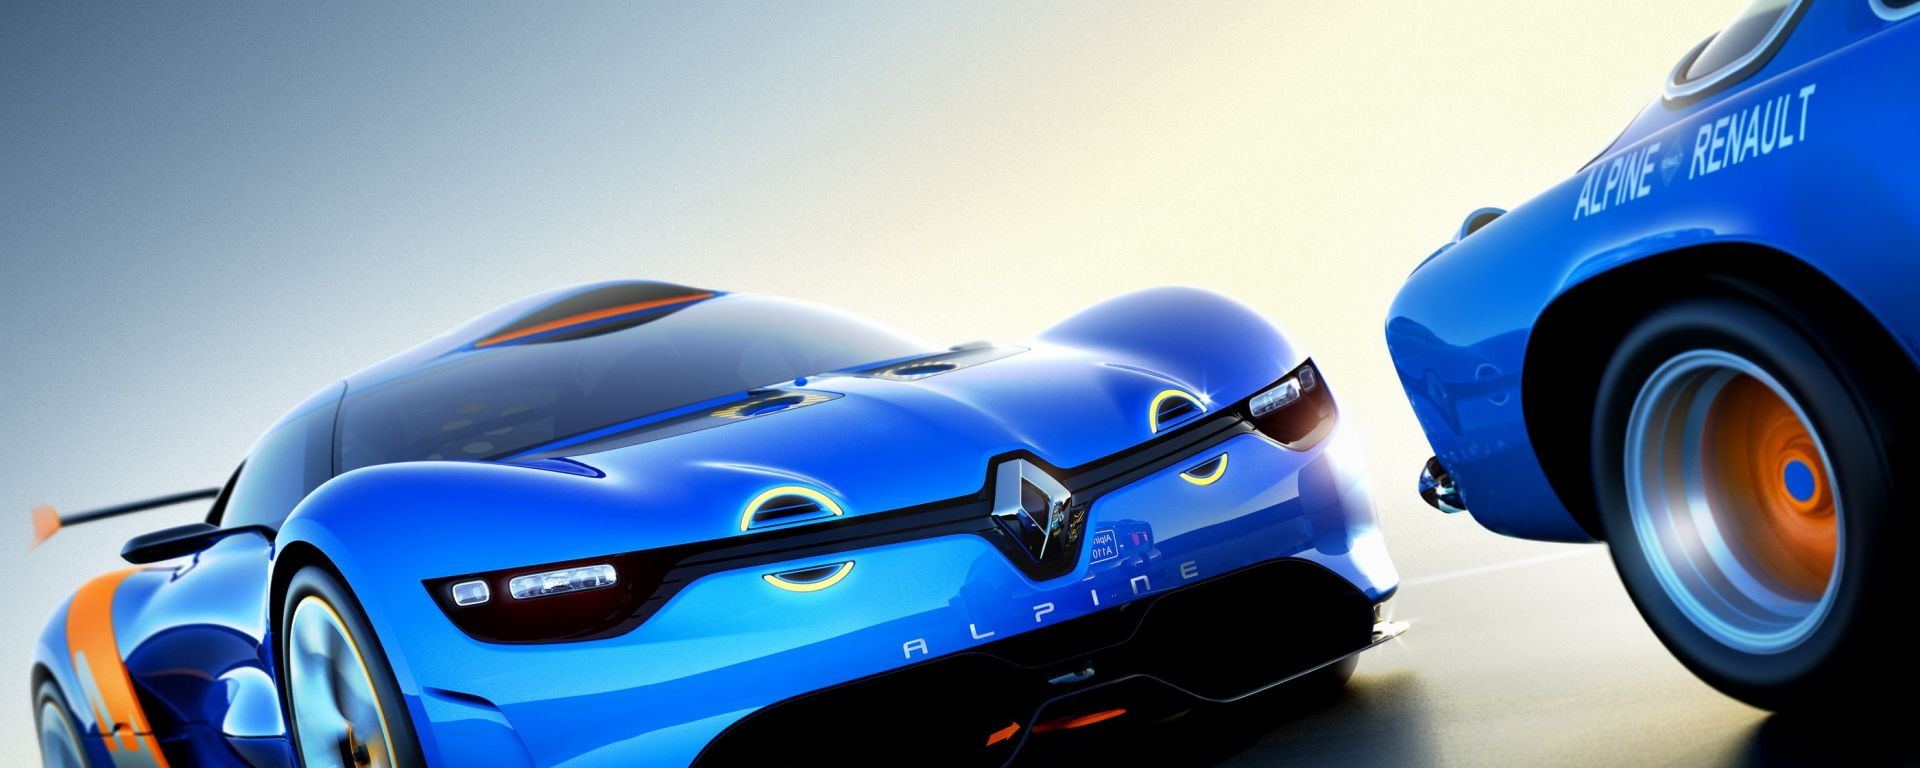 Renault Alpine A110-50: ecco un nuovo video